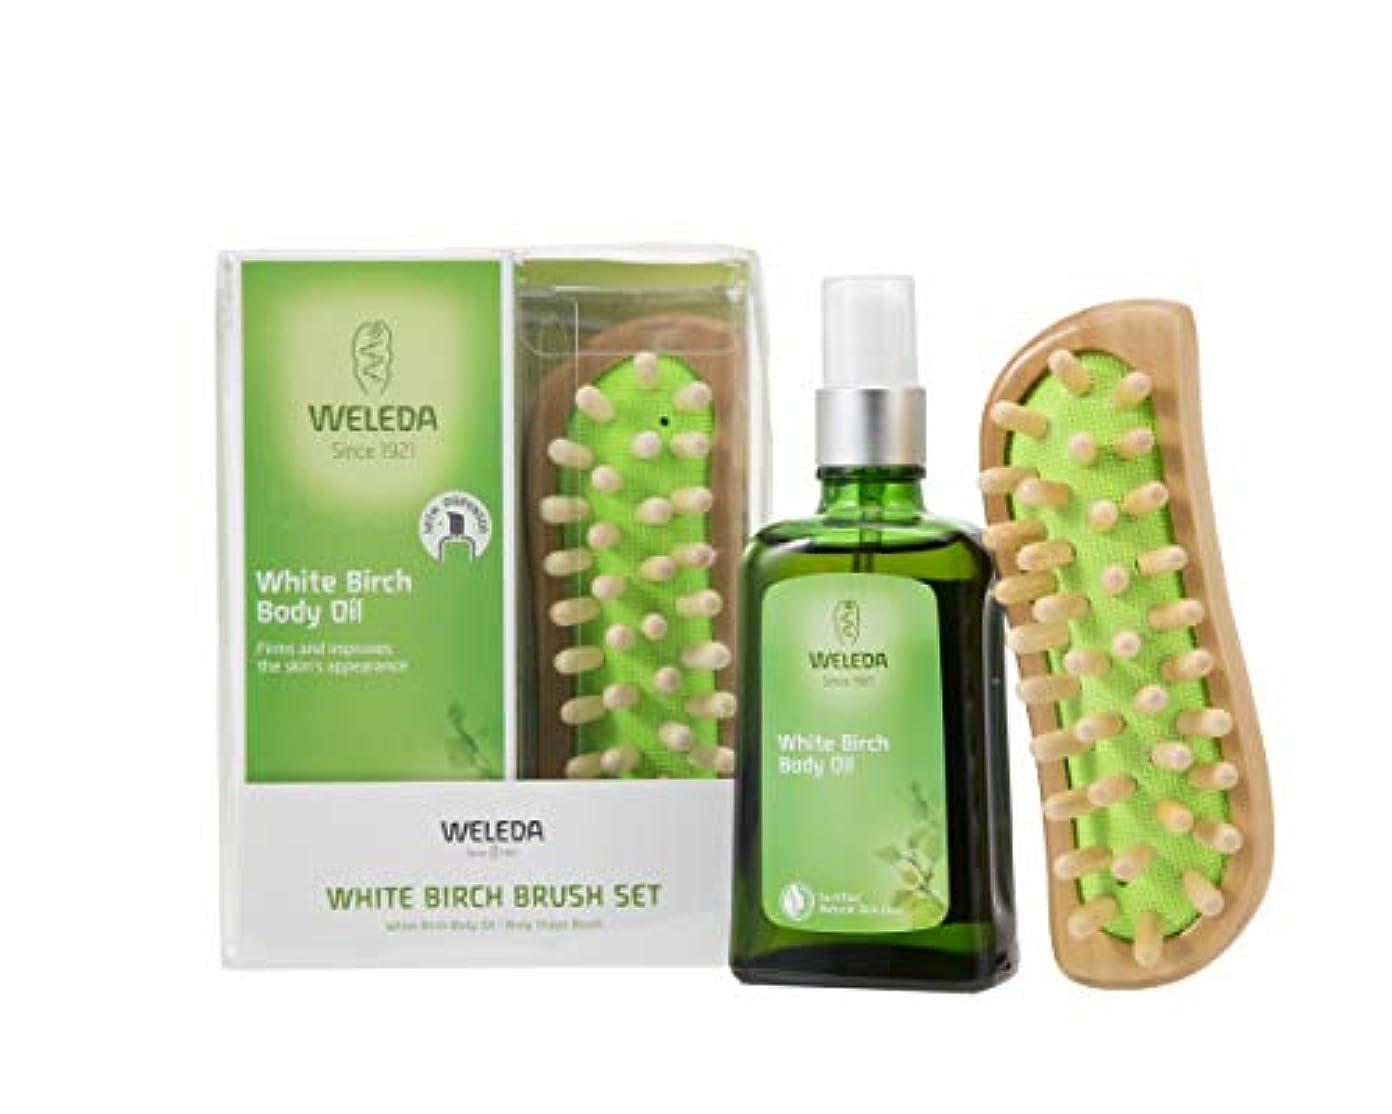 WELEDA(ヴェレダ) ホワイトバーチ&ブラシセット